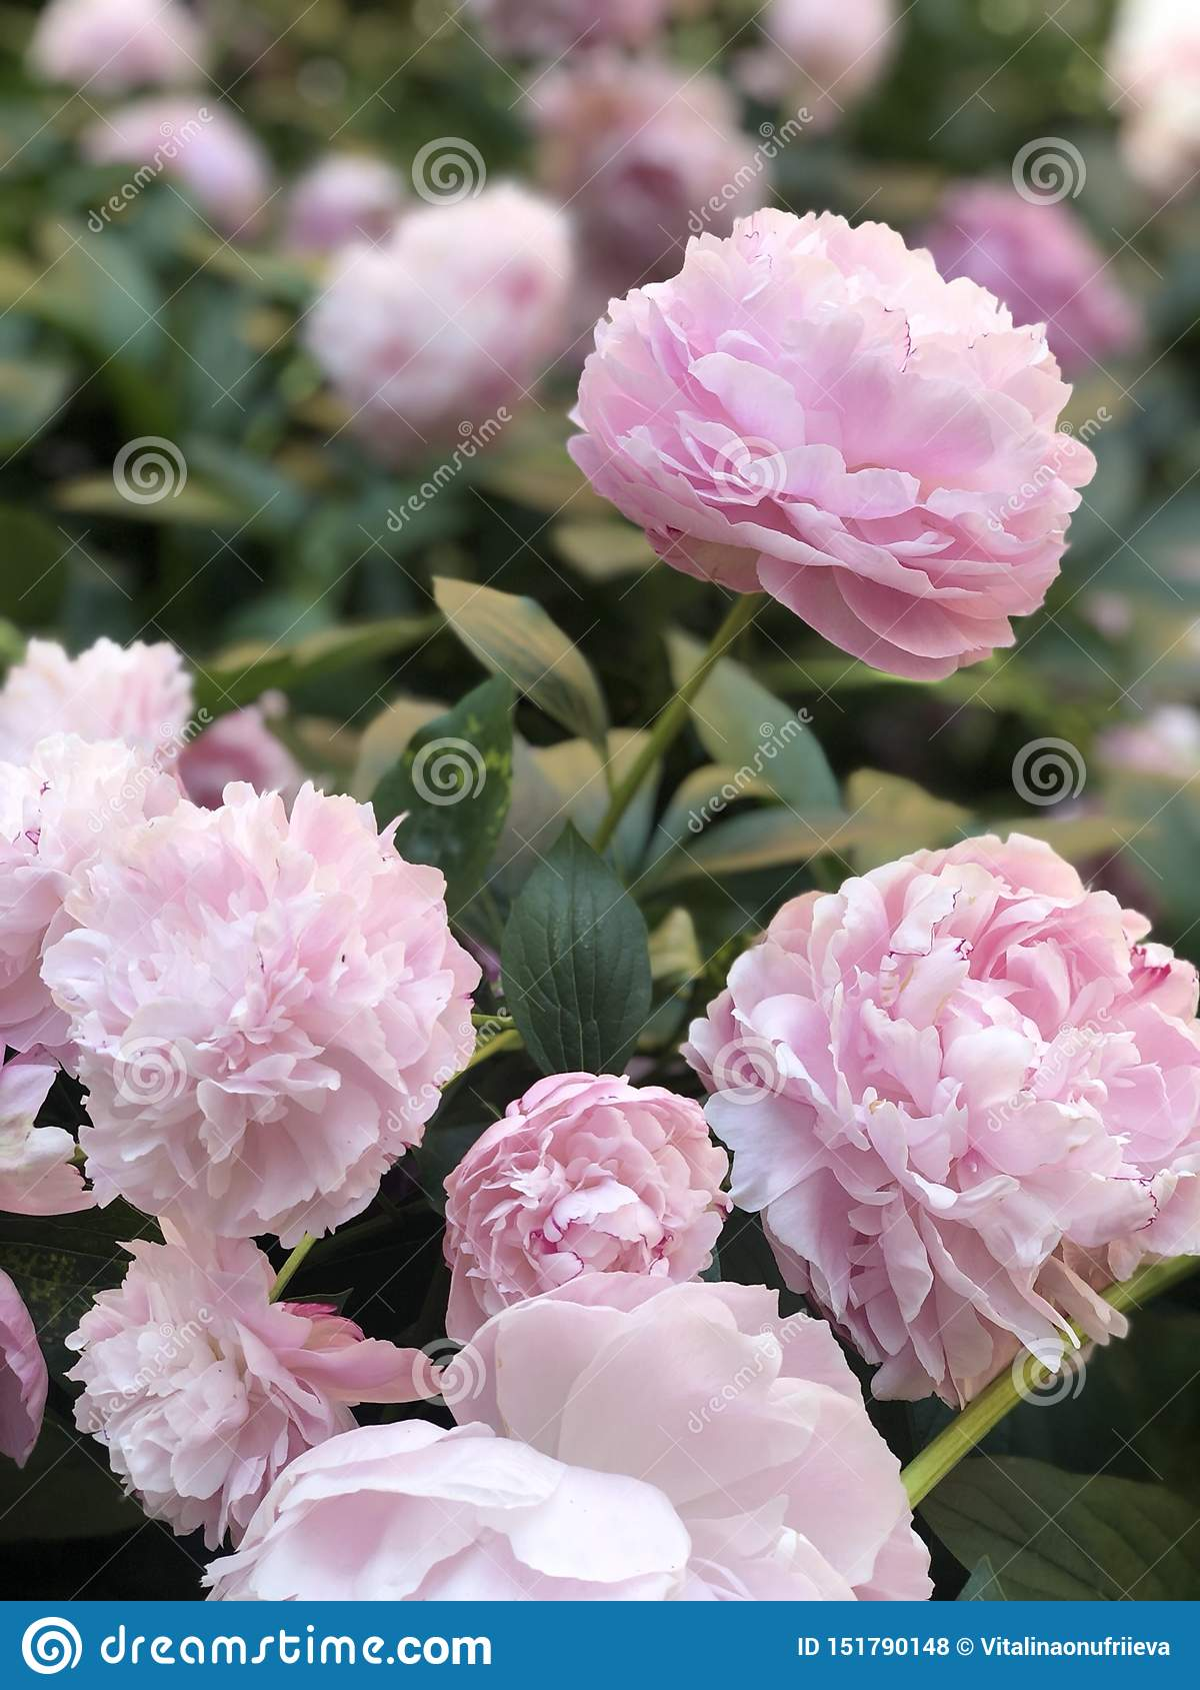 Ressort, tendresse de fleurs, rose, pivoines